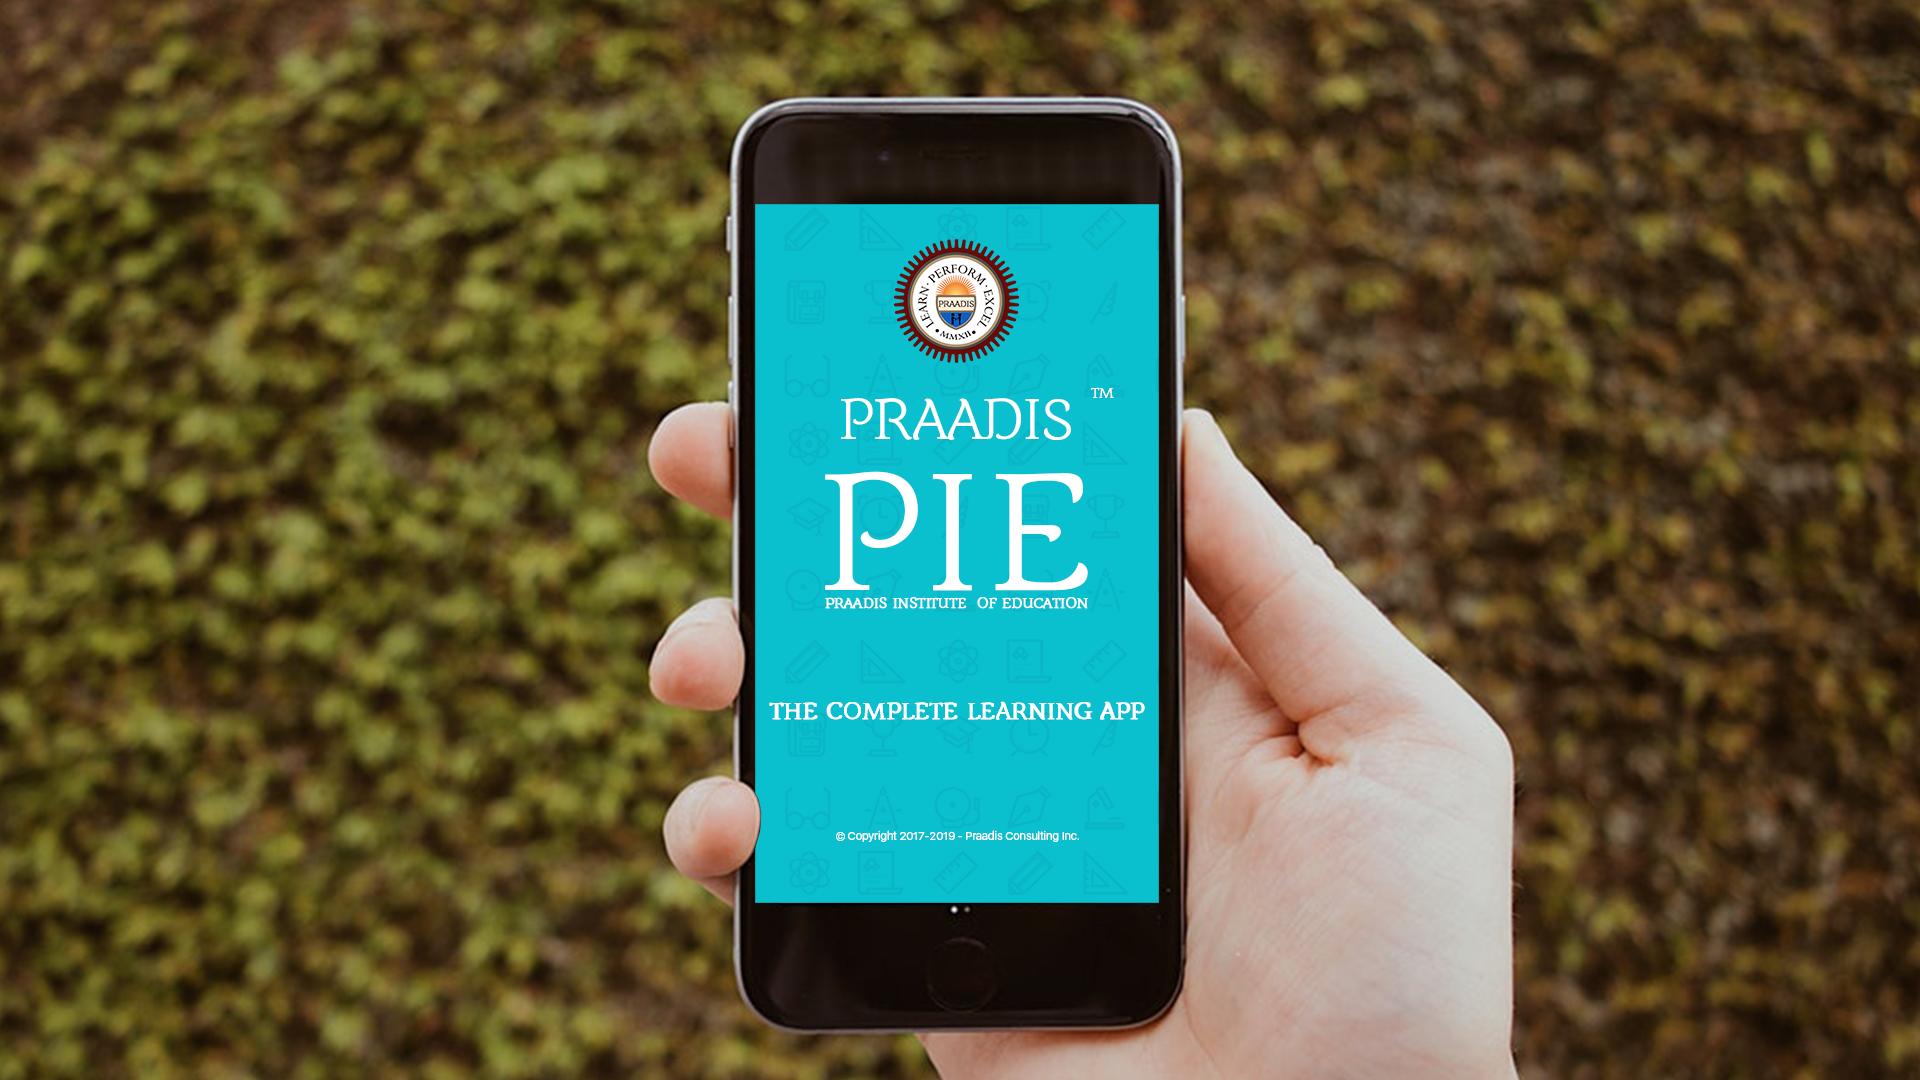 Benefits of learning through Praadis Education Application